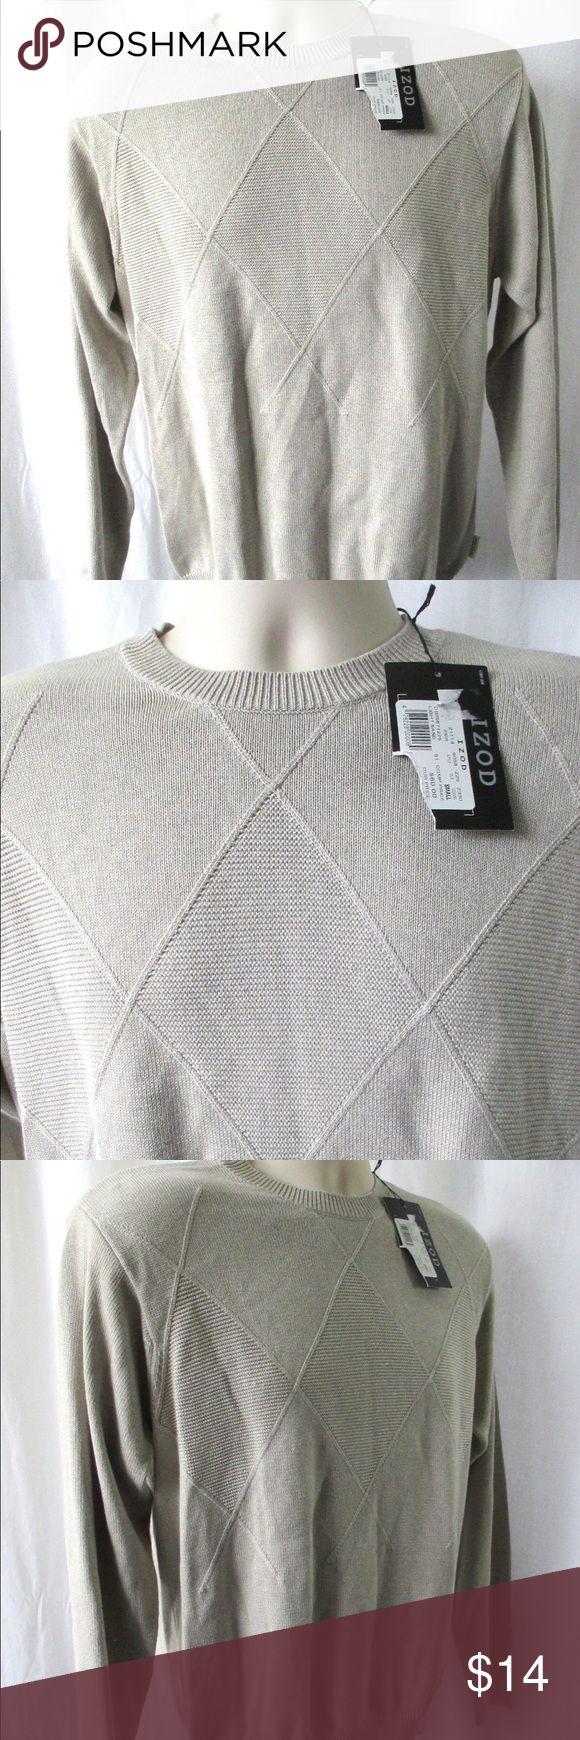 "Izod Men's Sweater Sz S Diamond Pattern Beige NEW IZOD SWEATER Size Small ""Lig…"